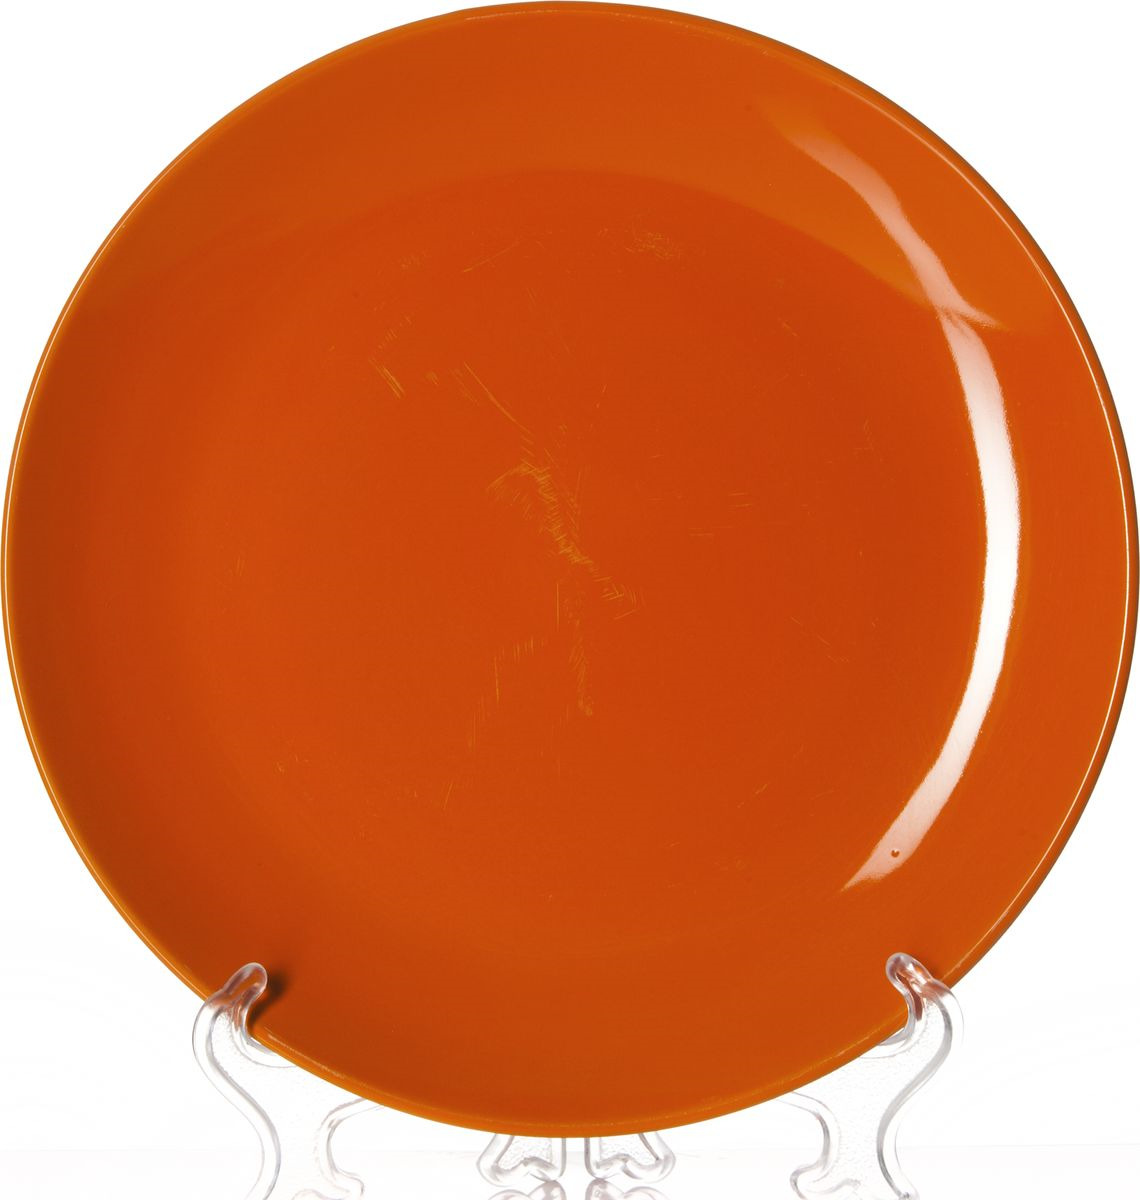 Тарелка Gotoff, 8221B, оранжевый, диаметр 25,5 см тарелка глубокая gotoff цвет фисташковый диаметр 18 5 см